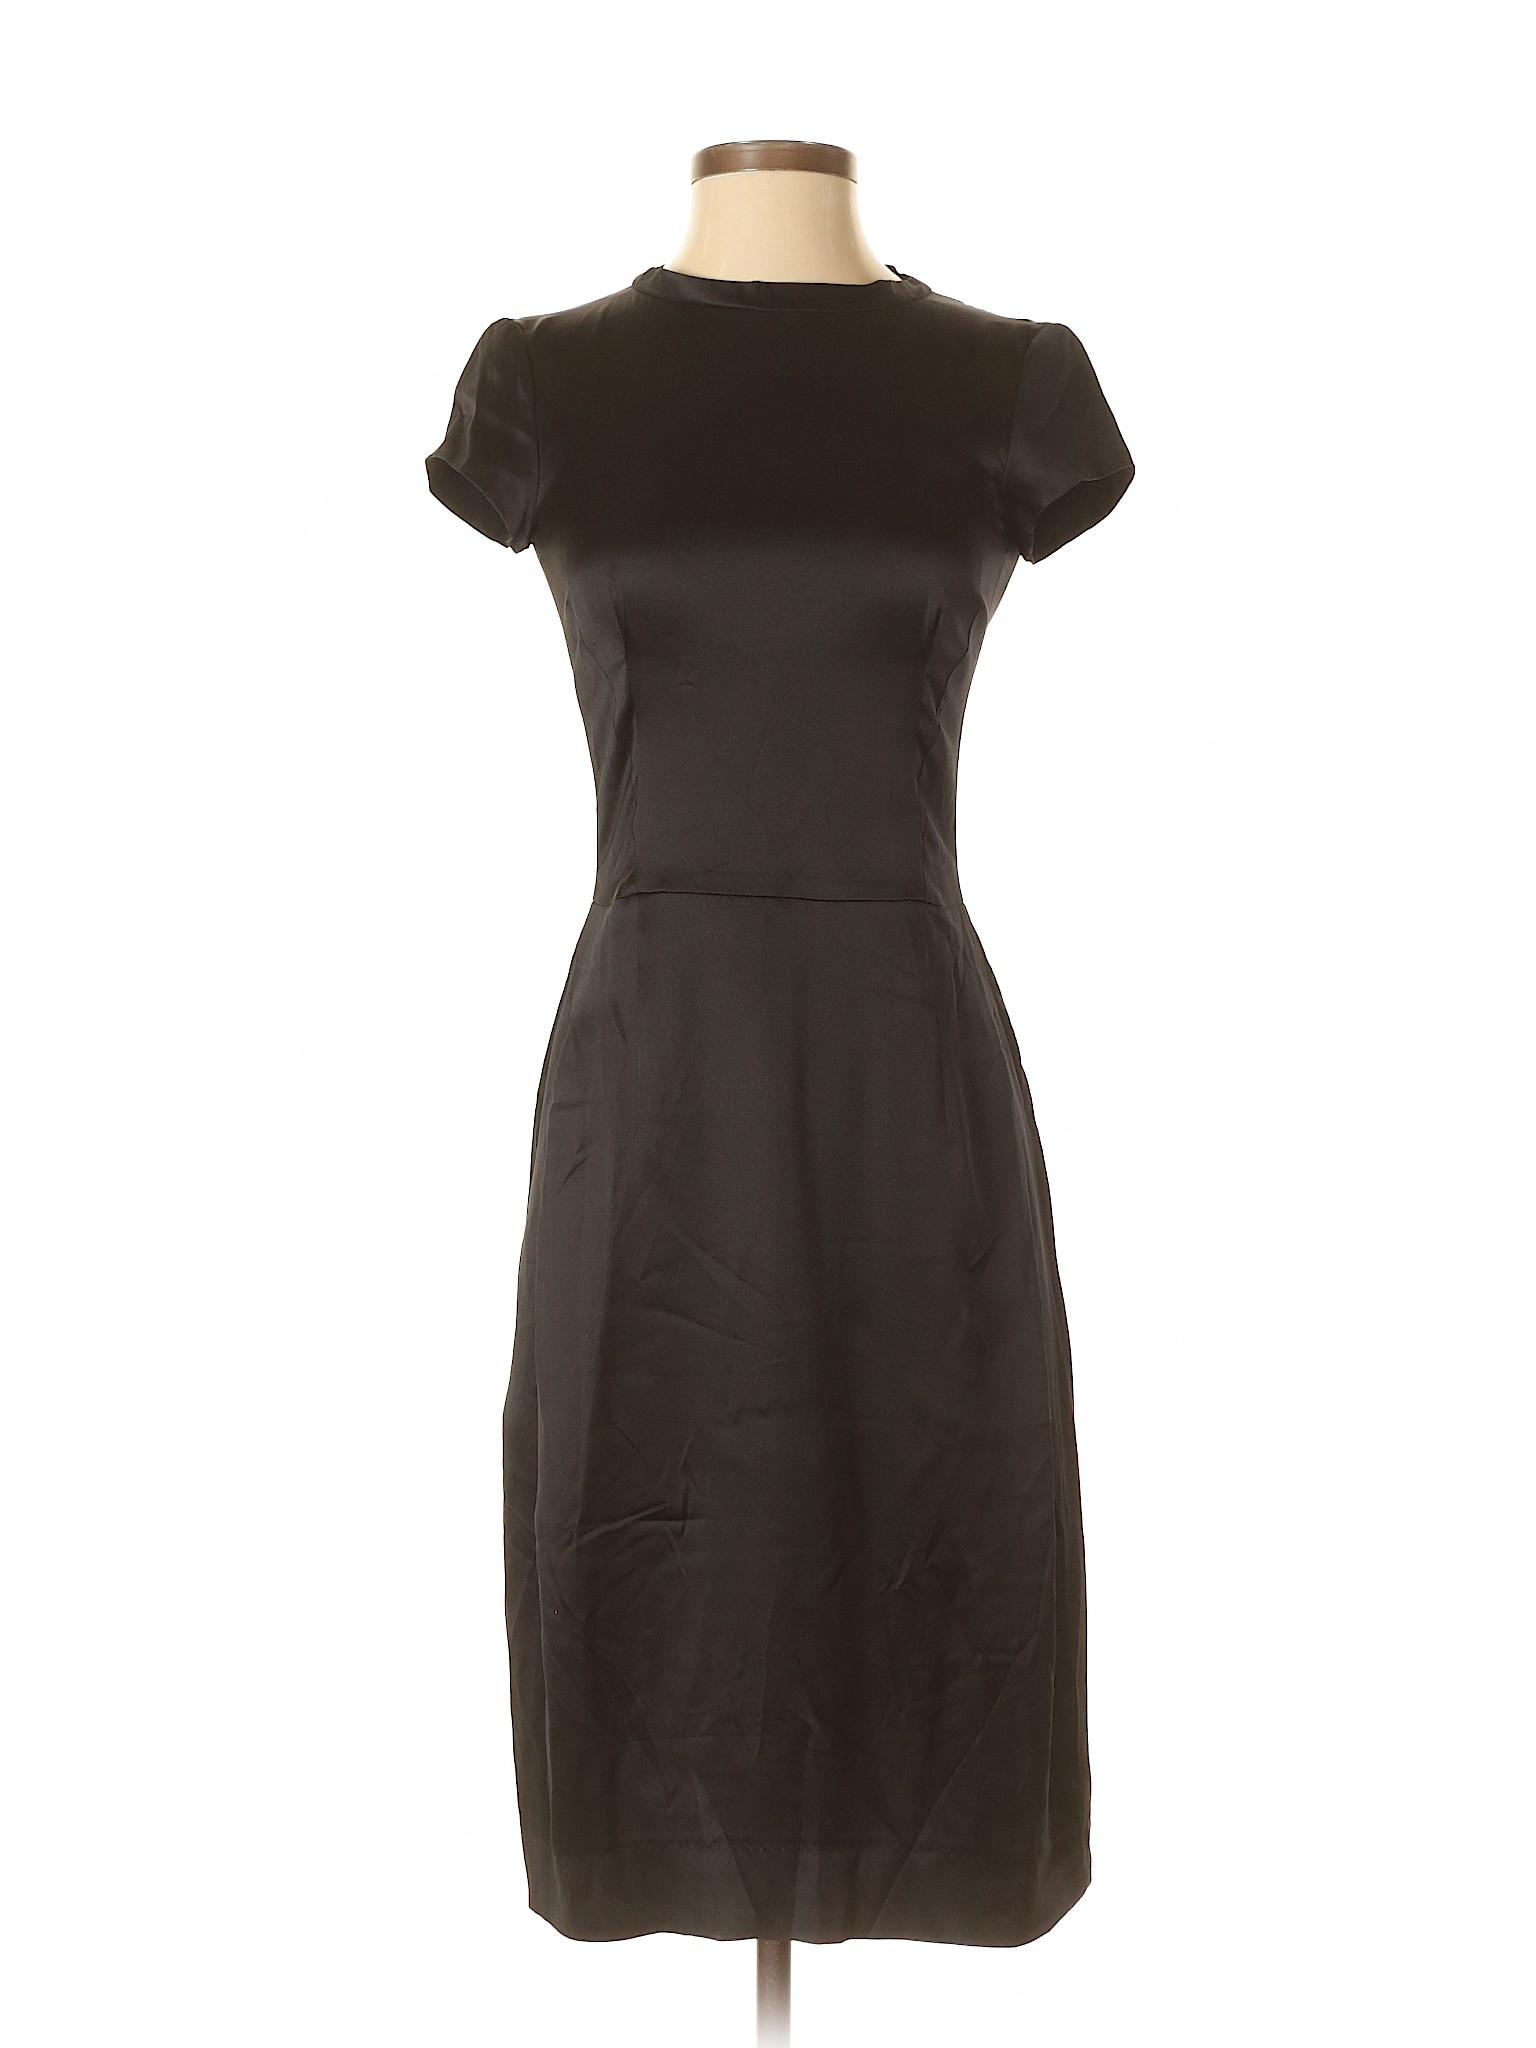 Dress BOSS Casual HUGO Selling BOSS by WRcqwAwfz